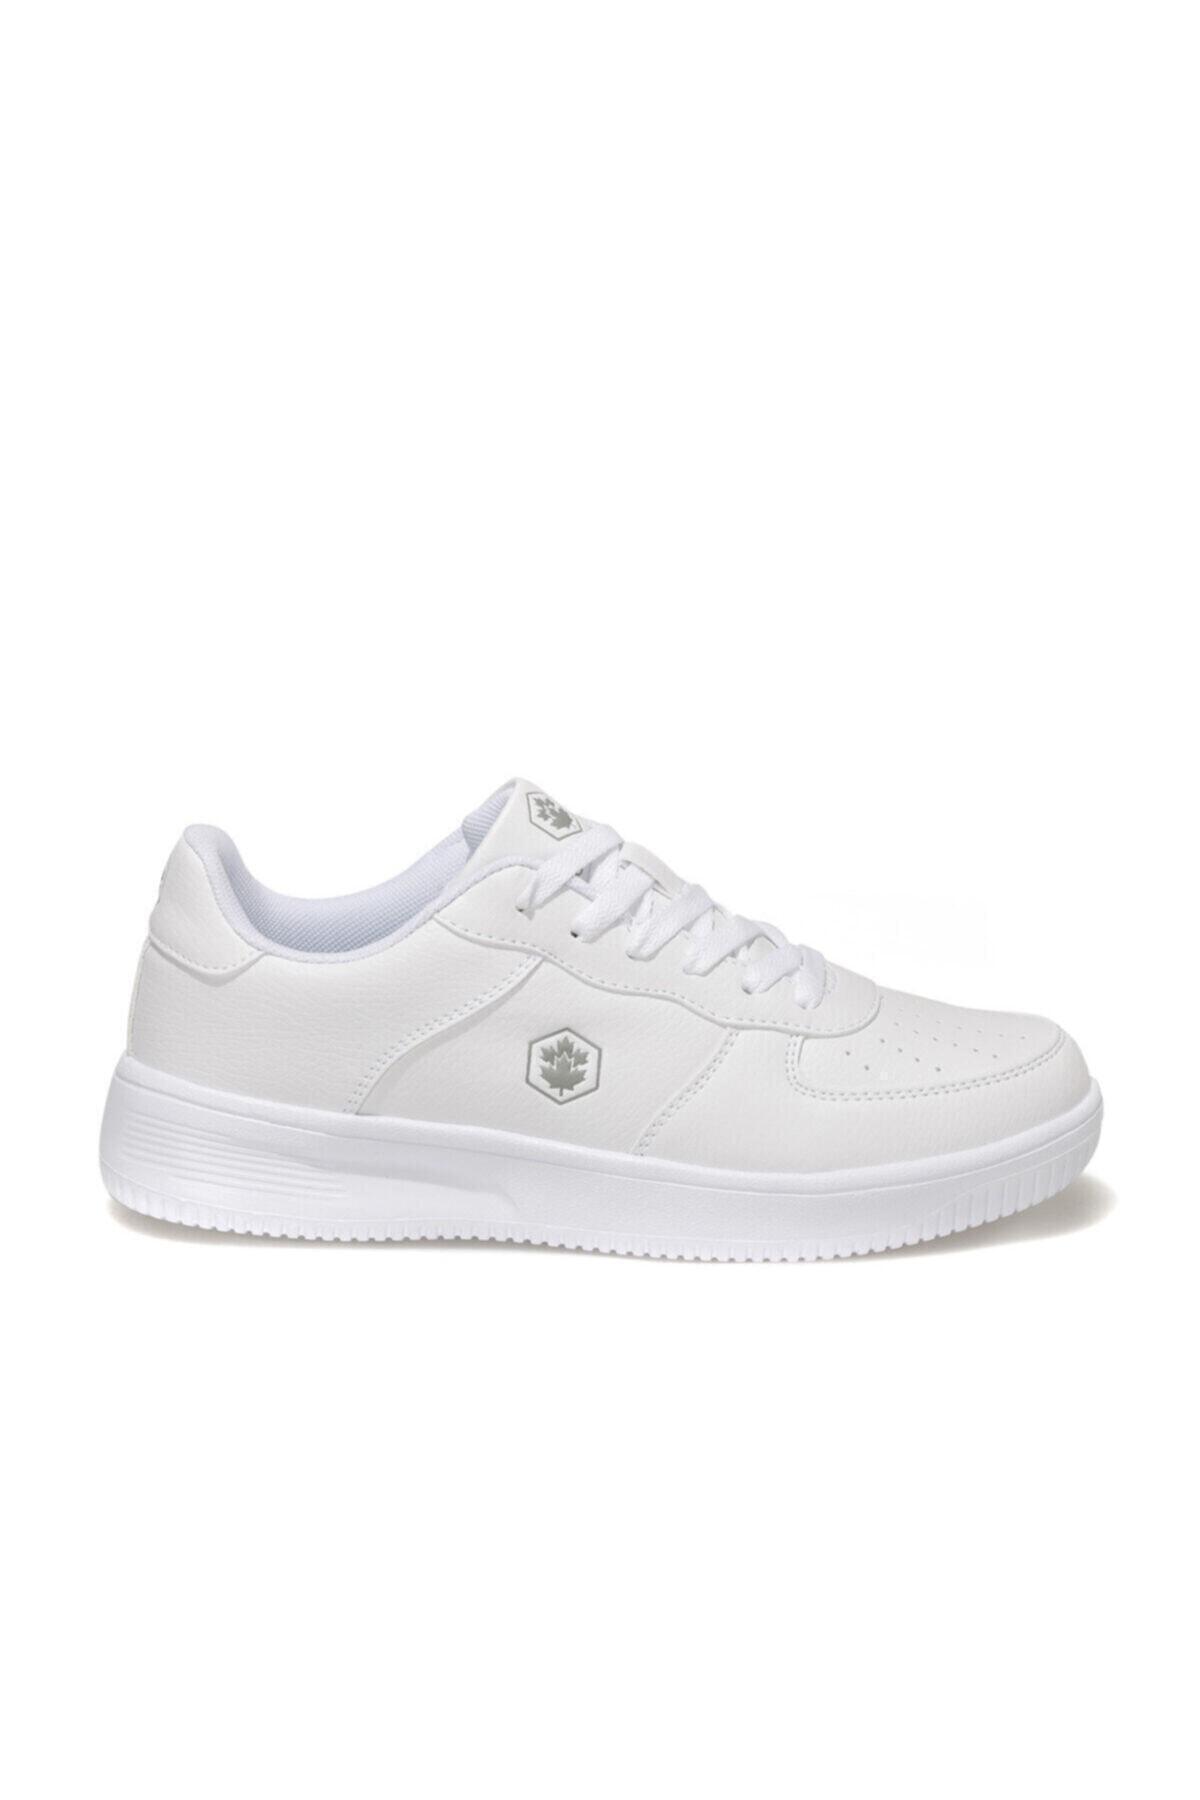 lumberjack FINSTER 1FX Beyaz Erkek Sneaker Ayakkabı 100784937 2